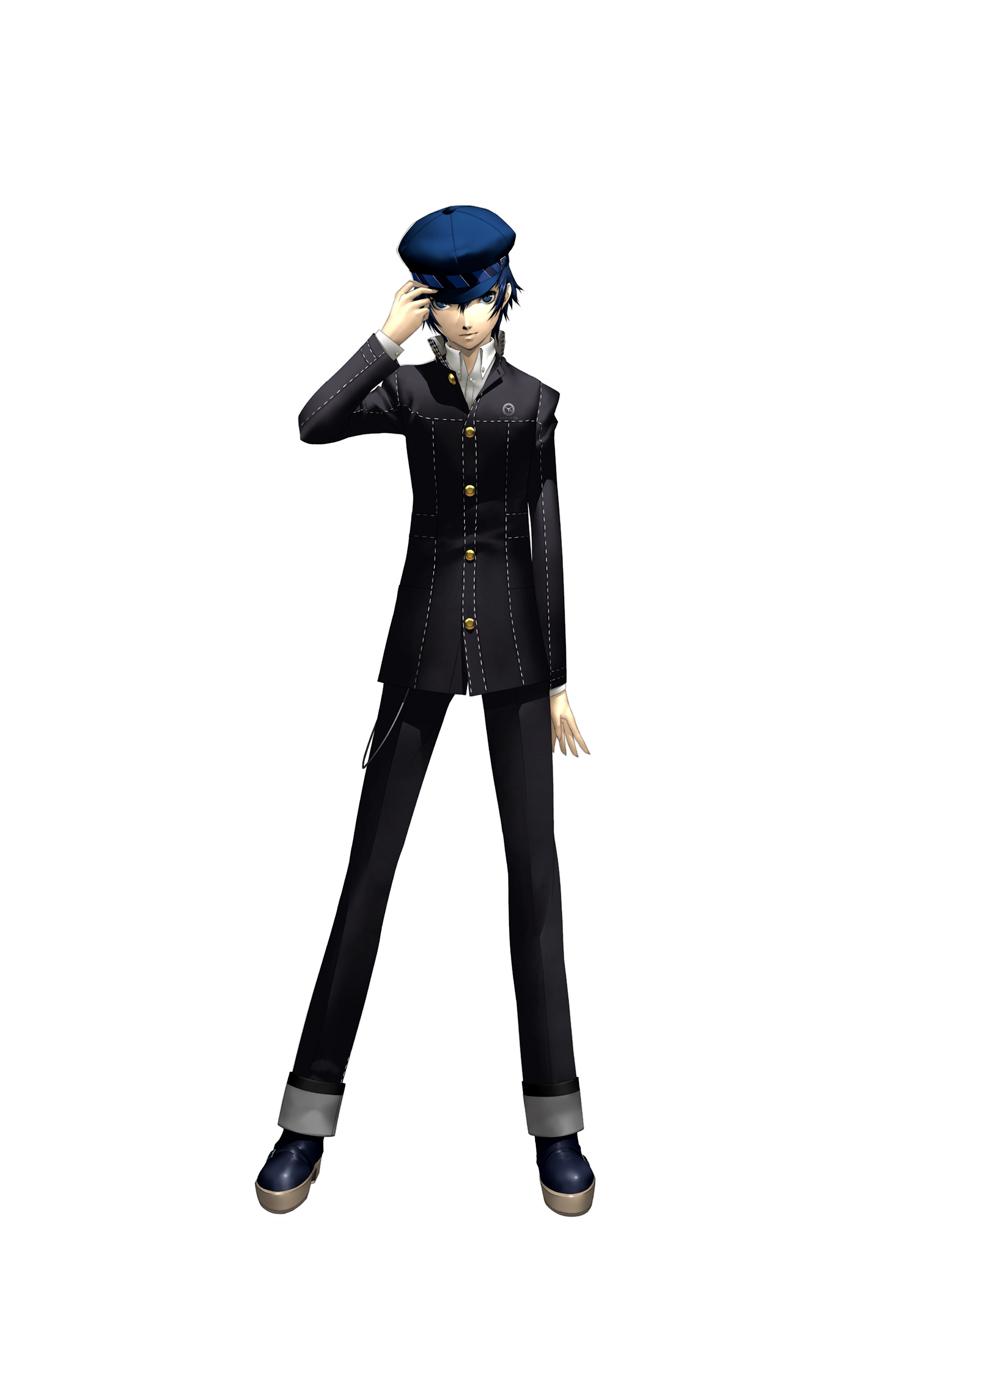 androgynous blue_eyes blue_hair cabbie_hat hat highres jacket official_art persona persona_4 reverse_trap shigenori_soejima shirogane_naoto short_hair soejima_shigenori solo